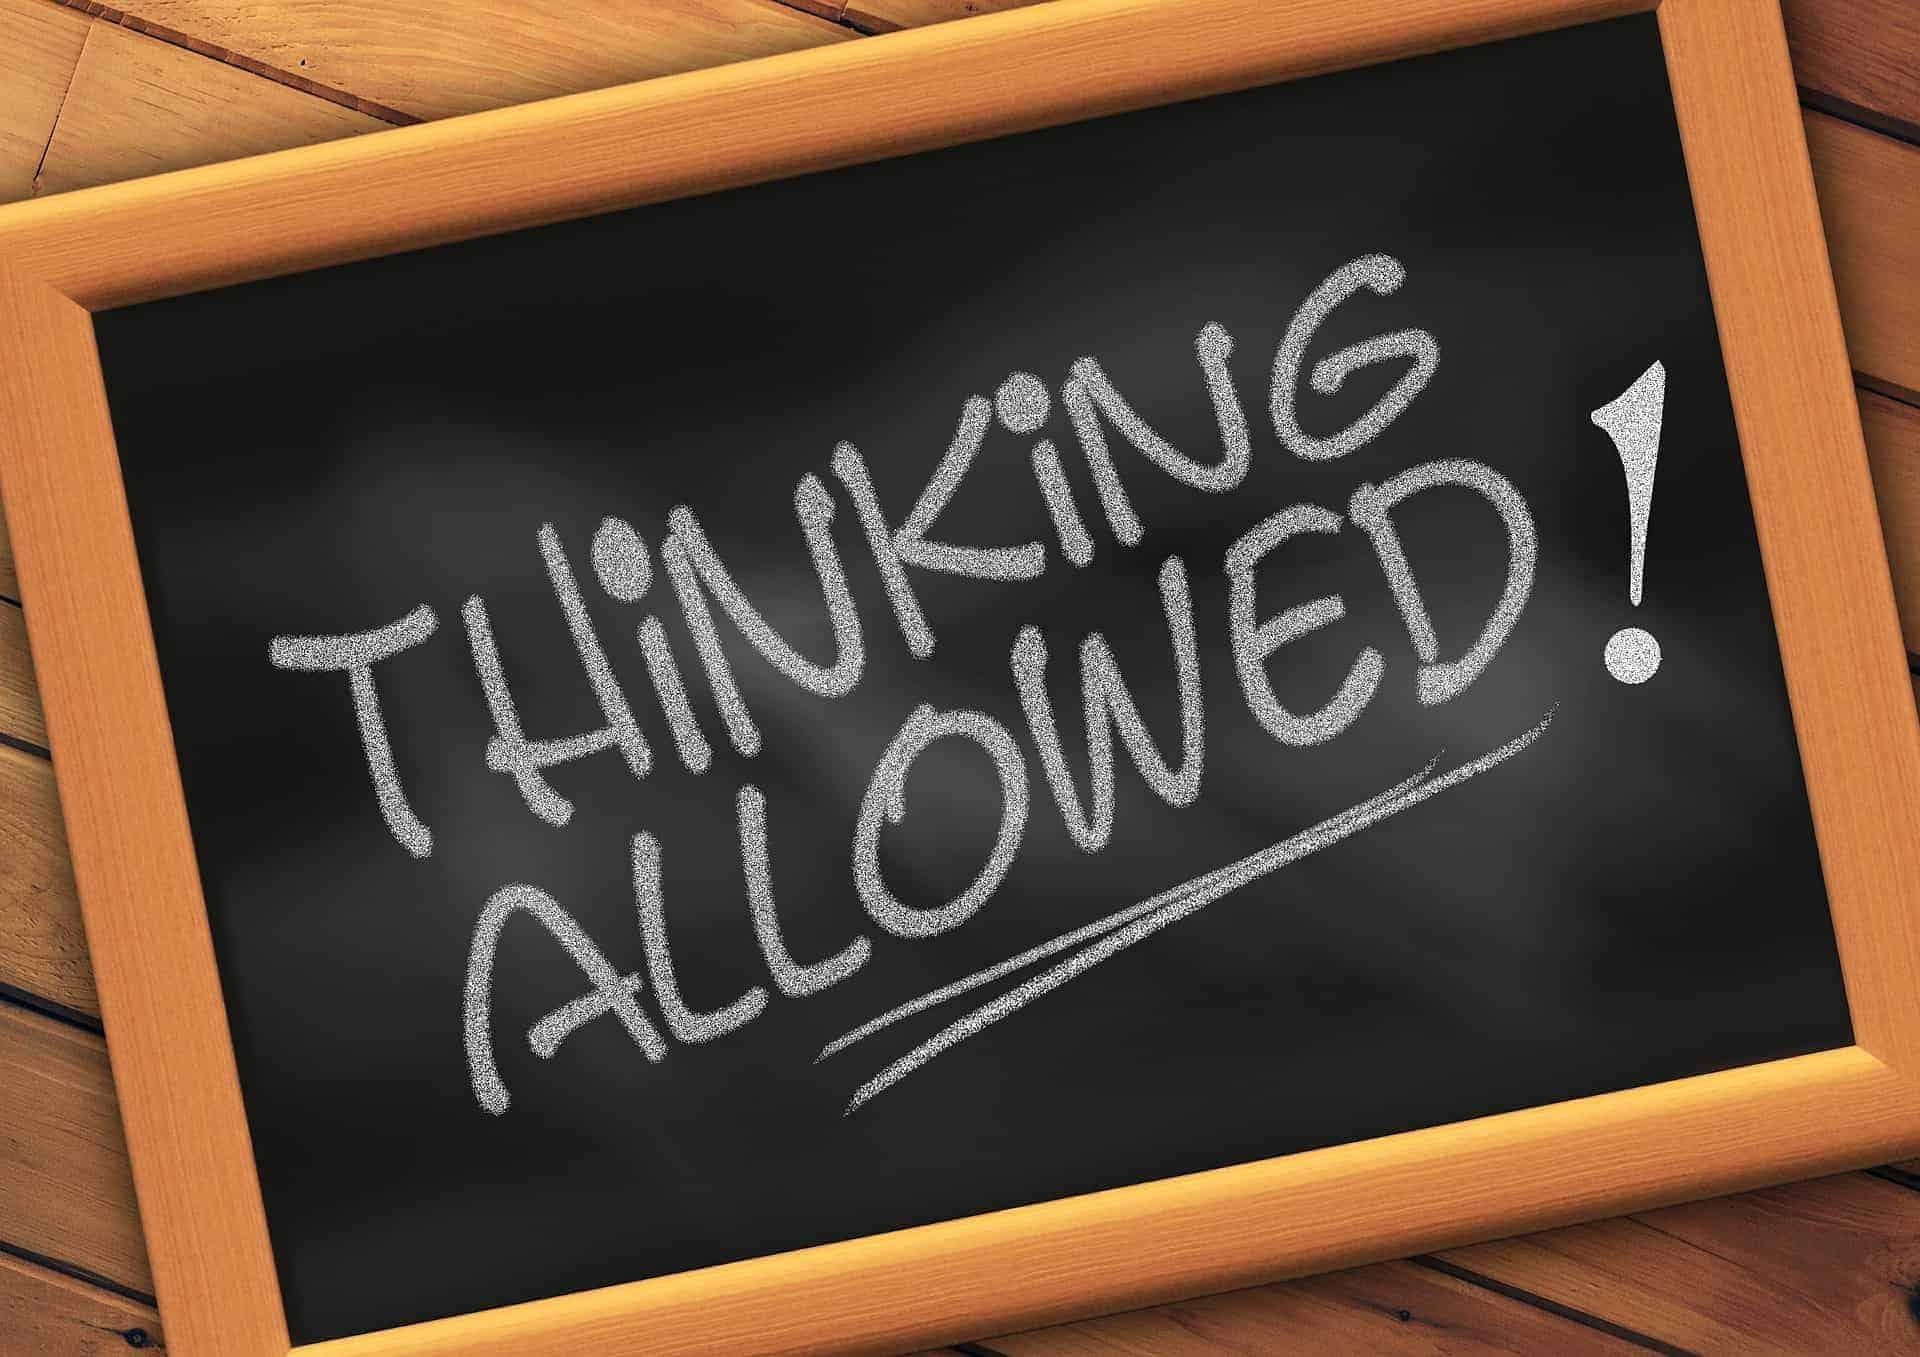 Thinking board